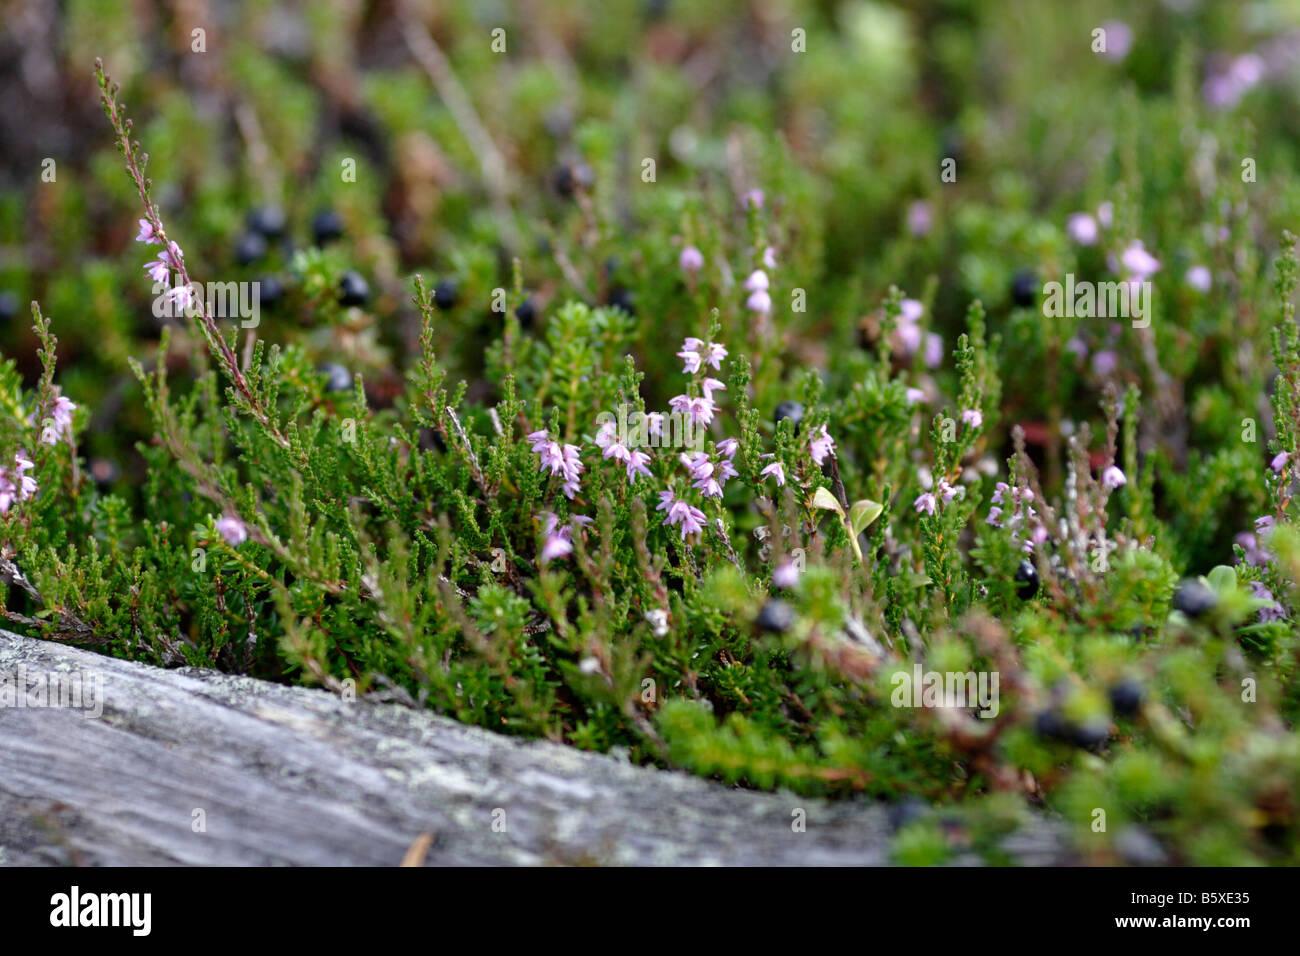 Flowering Heath in Sweden (Dalarna) - Stock Image